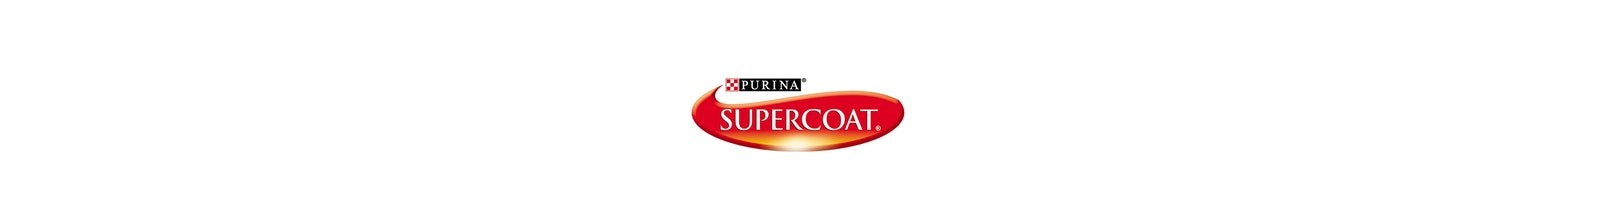 Supercoat brand